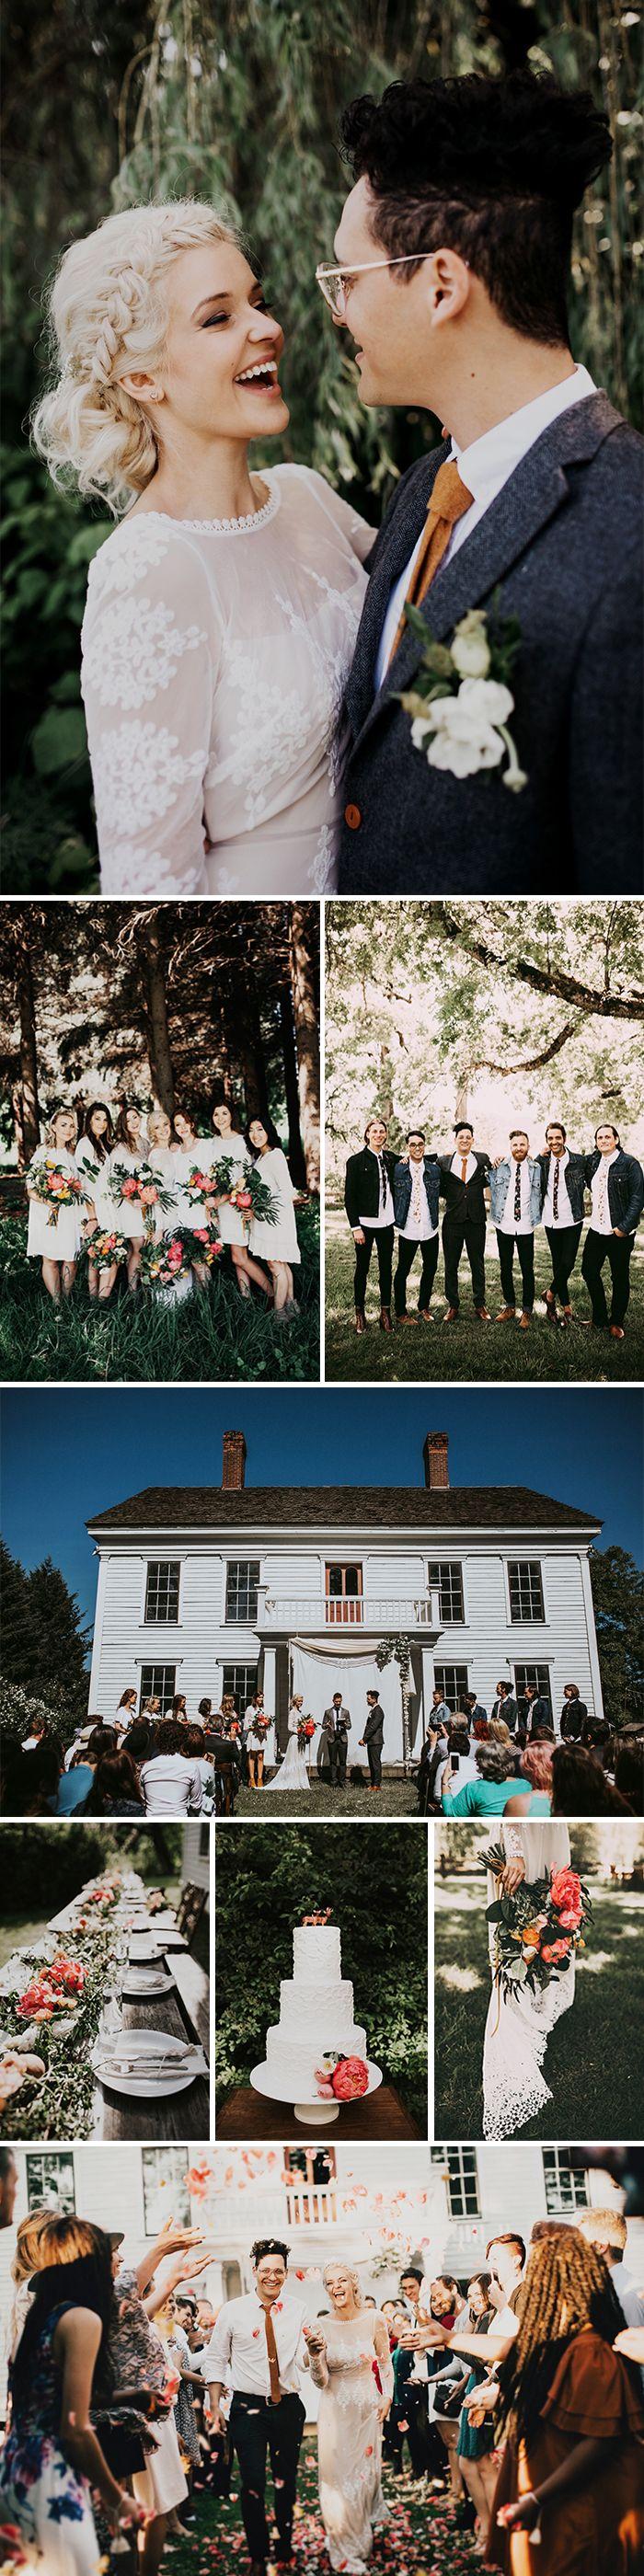 591 best Wedding Decor images on Pinterest